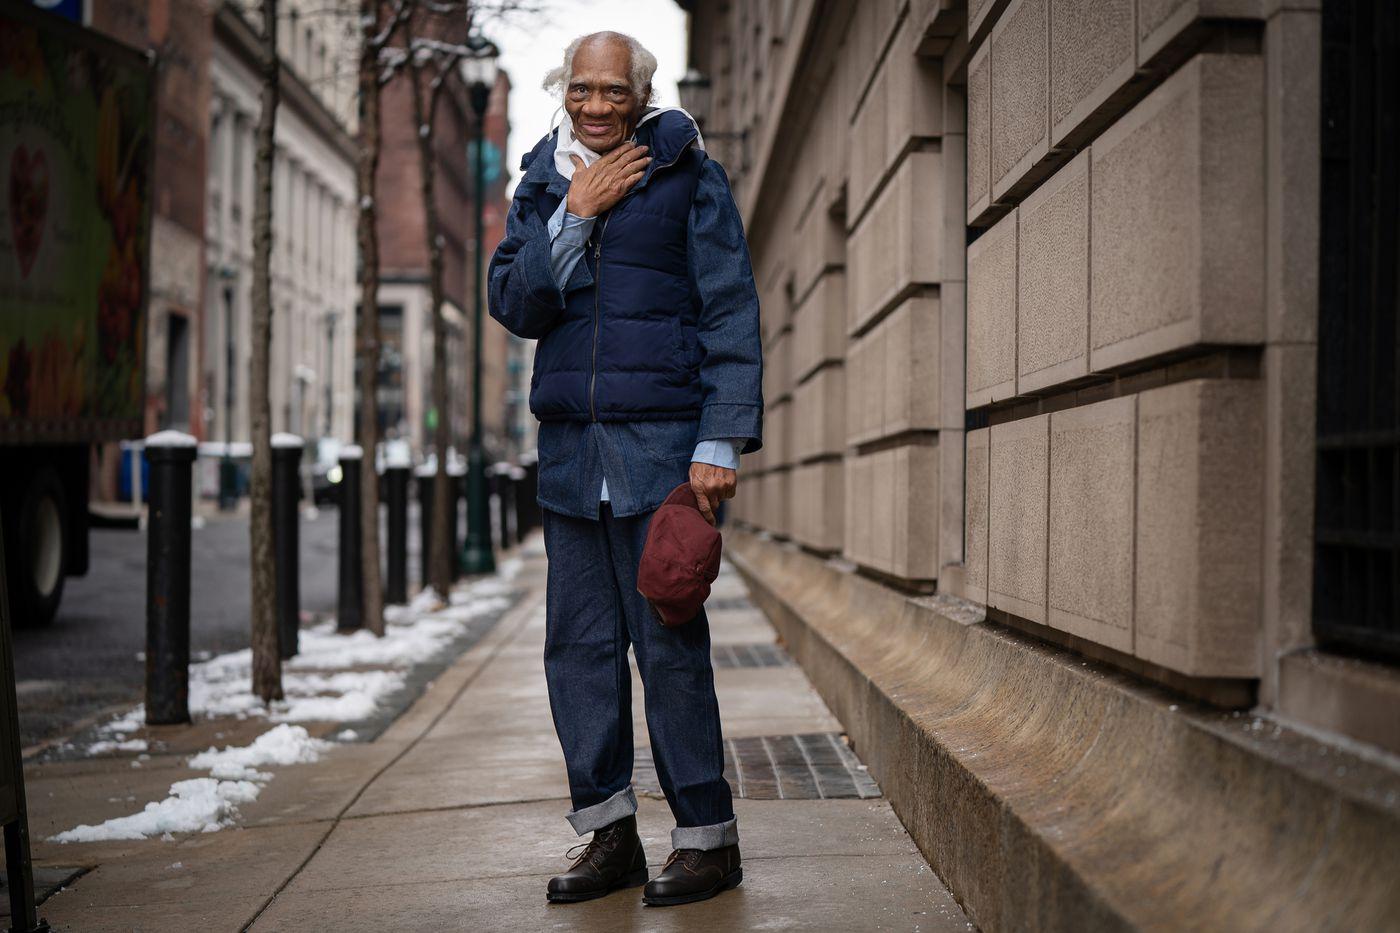 Joe Ligon stops for a portrait outside his lawyers office, in Center City.